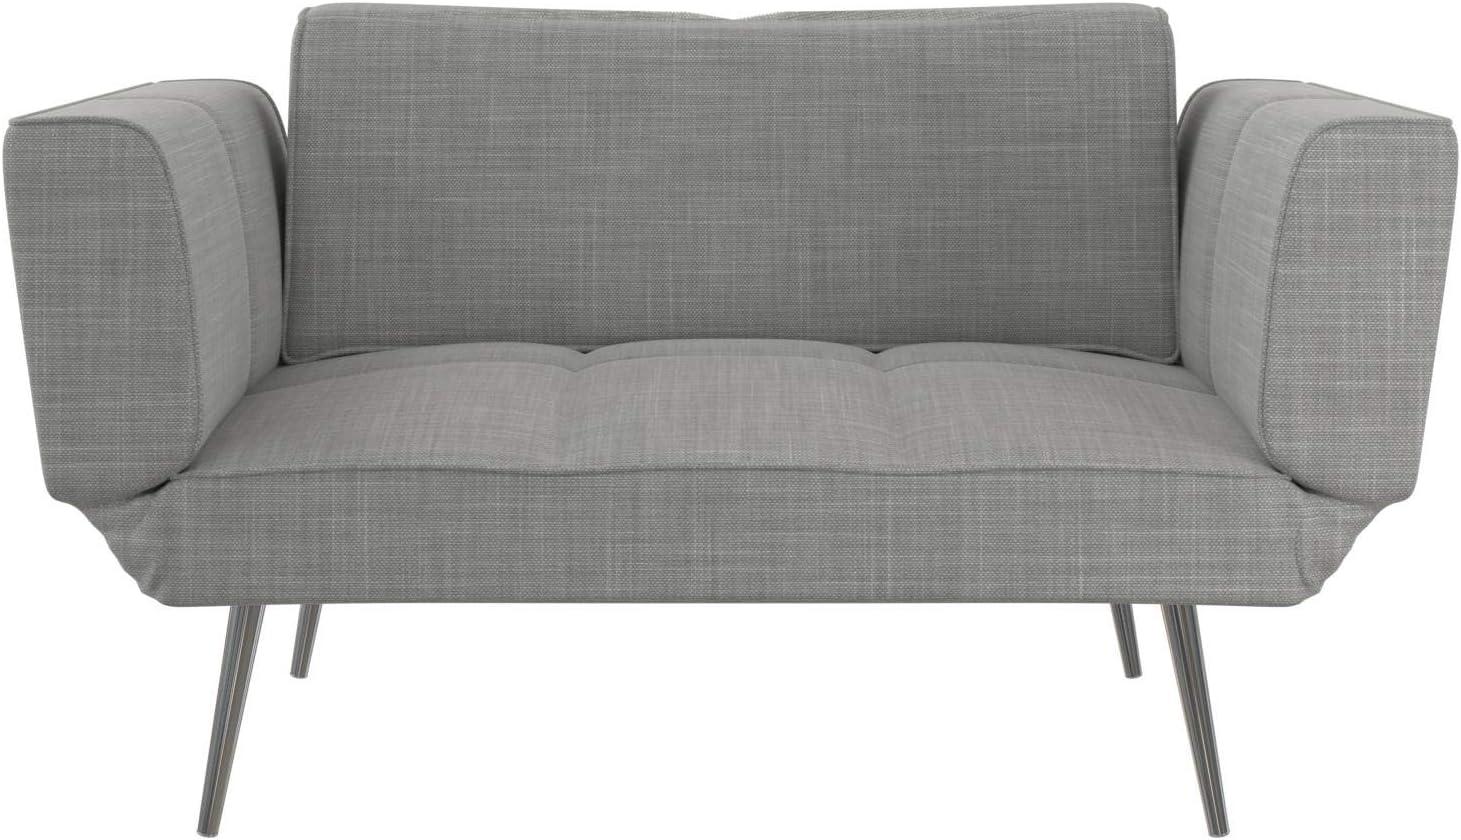 Novogratz Leyla Loveseat with Magazine Storage Adjustable Sofa Bed Armrests to Convert into a Couch Sleeper Light Gray Futon